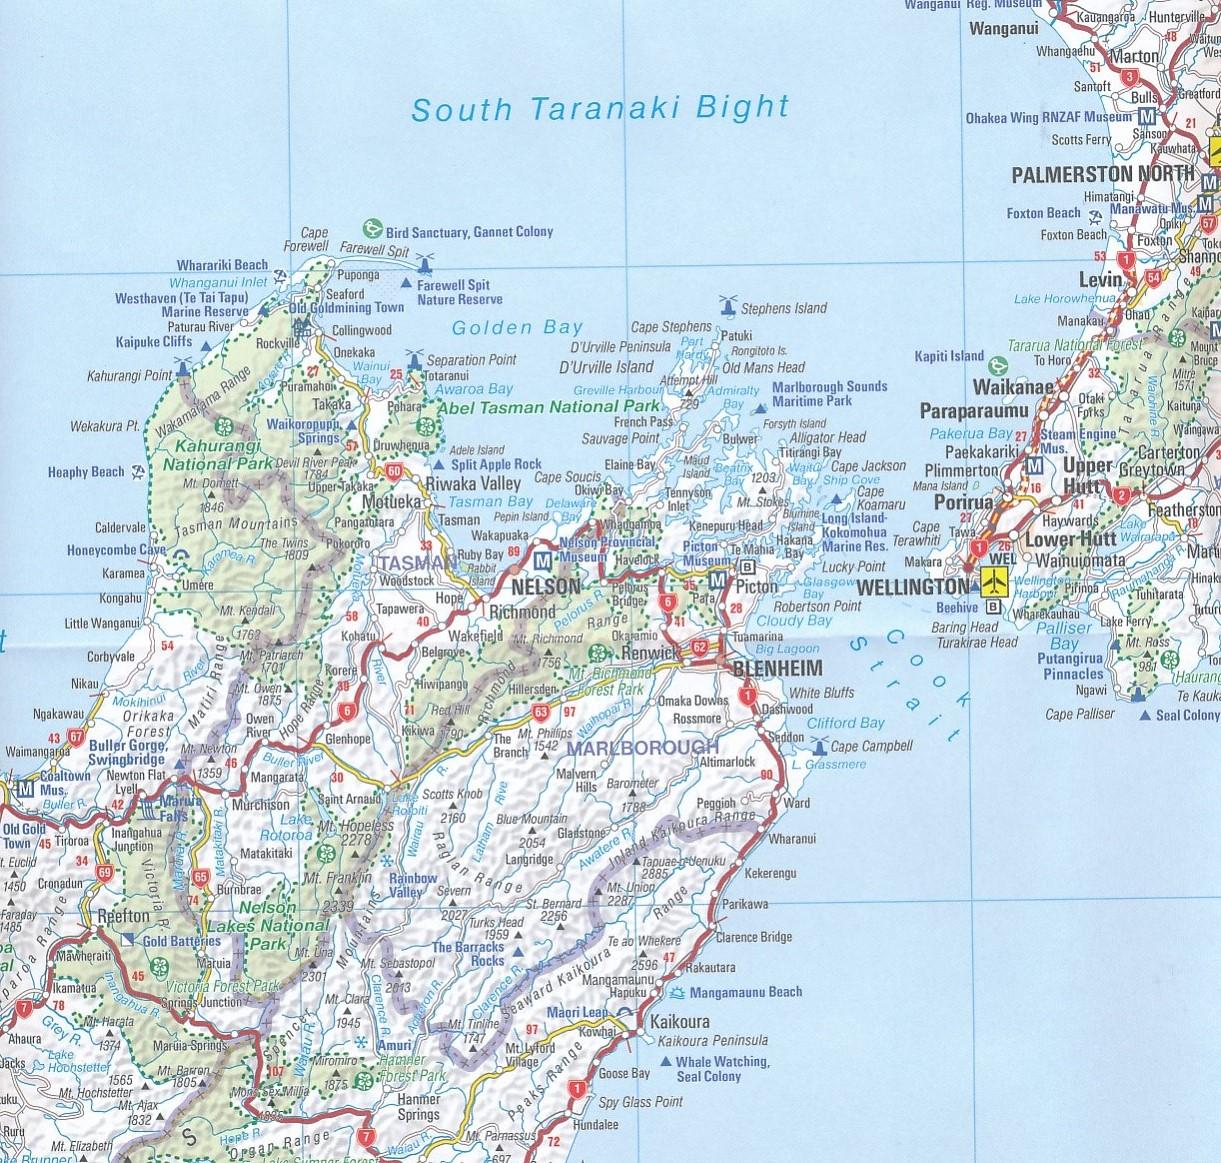 wegenkaart - landkaart 790 new zealand